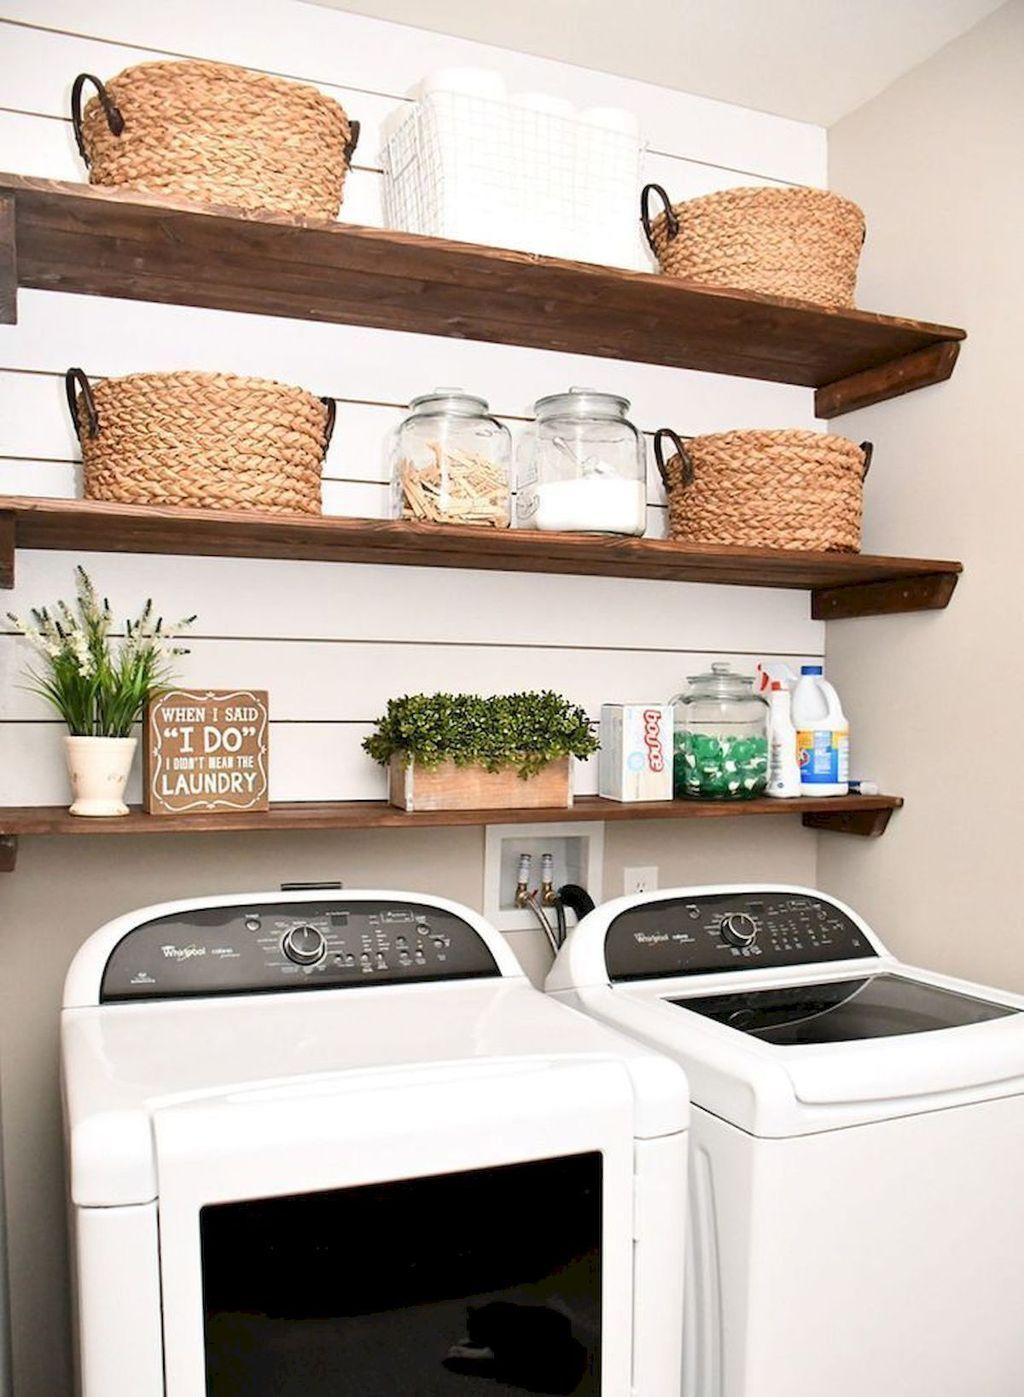 Amazing Simple Laundry Room Design Ideas images